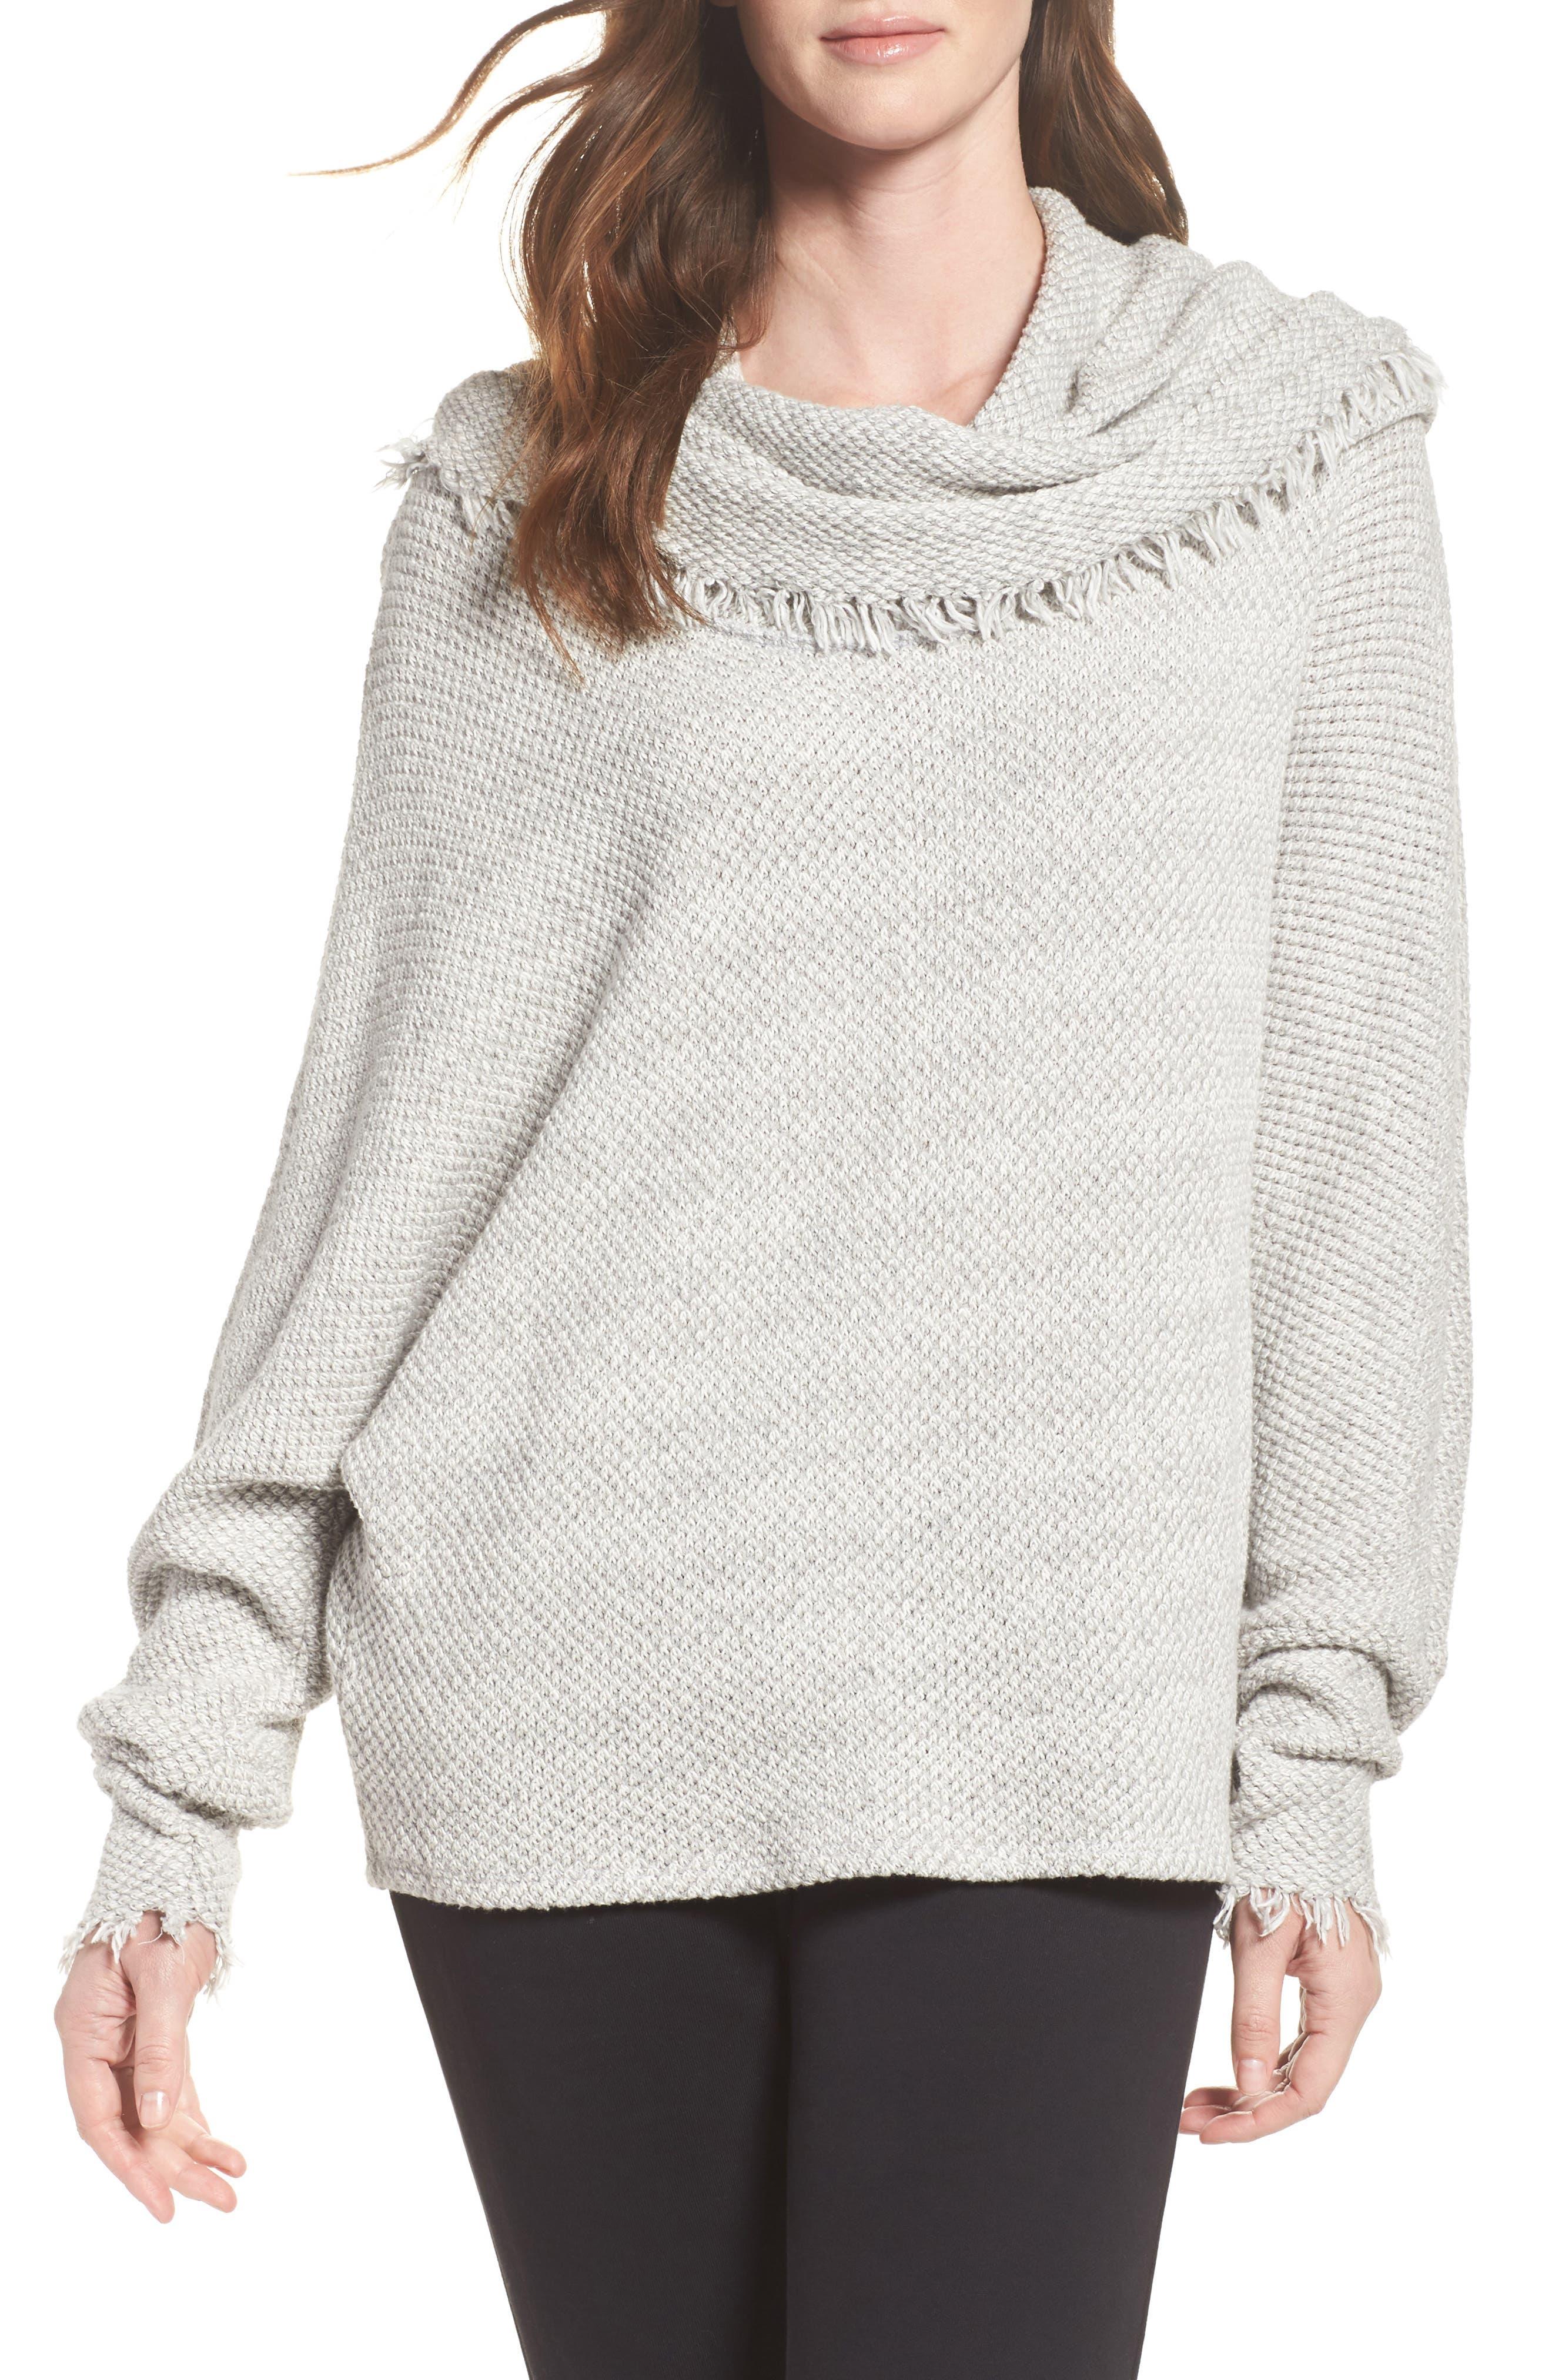 Oversize Turtleneck Sweater,                             Main thumbnail 1, color,                             Heather Grey